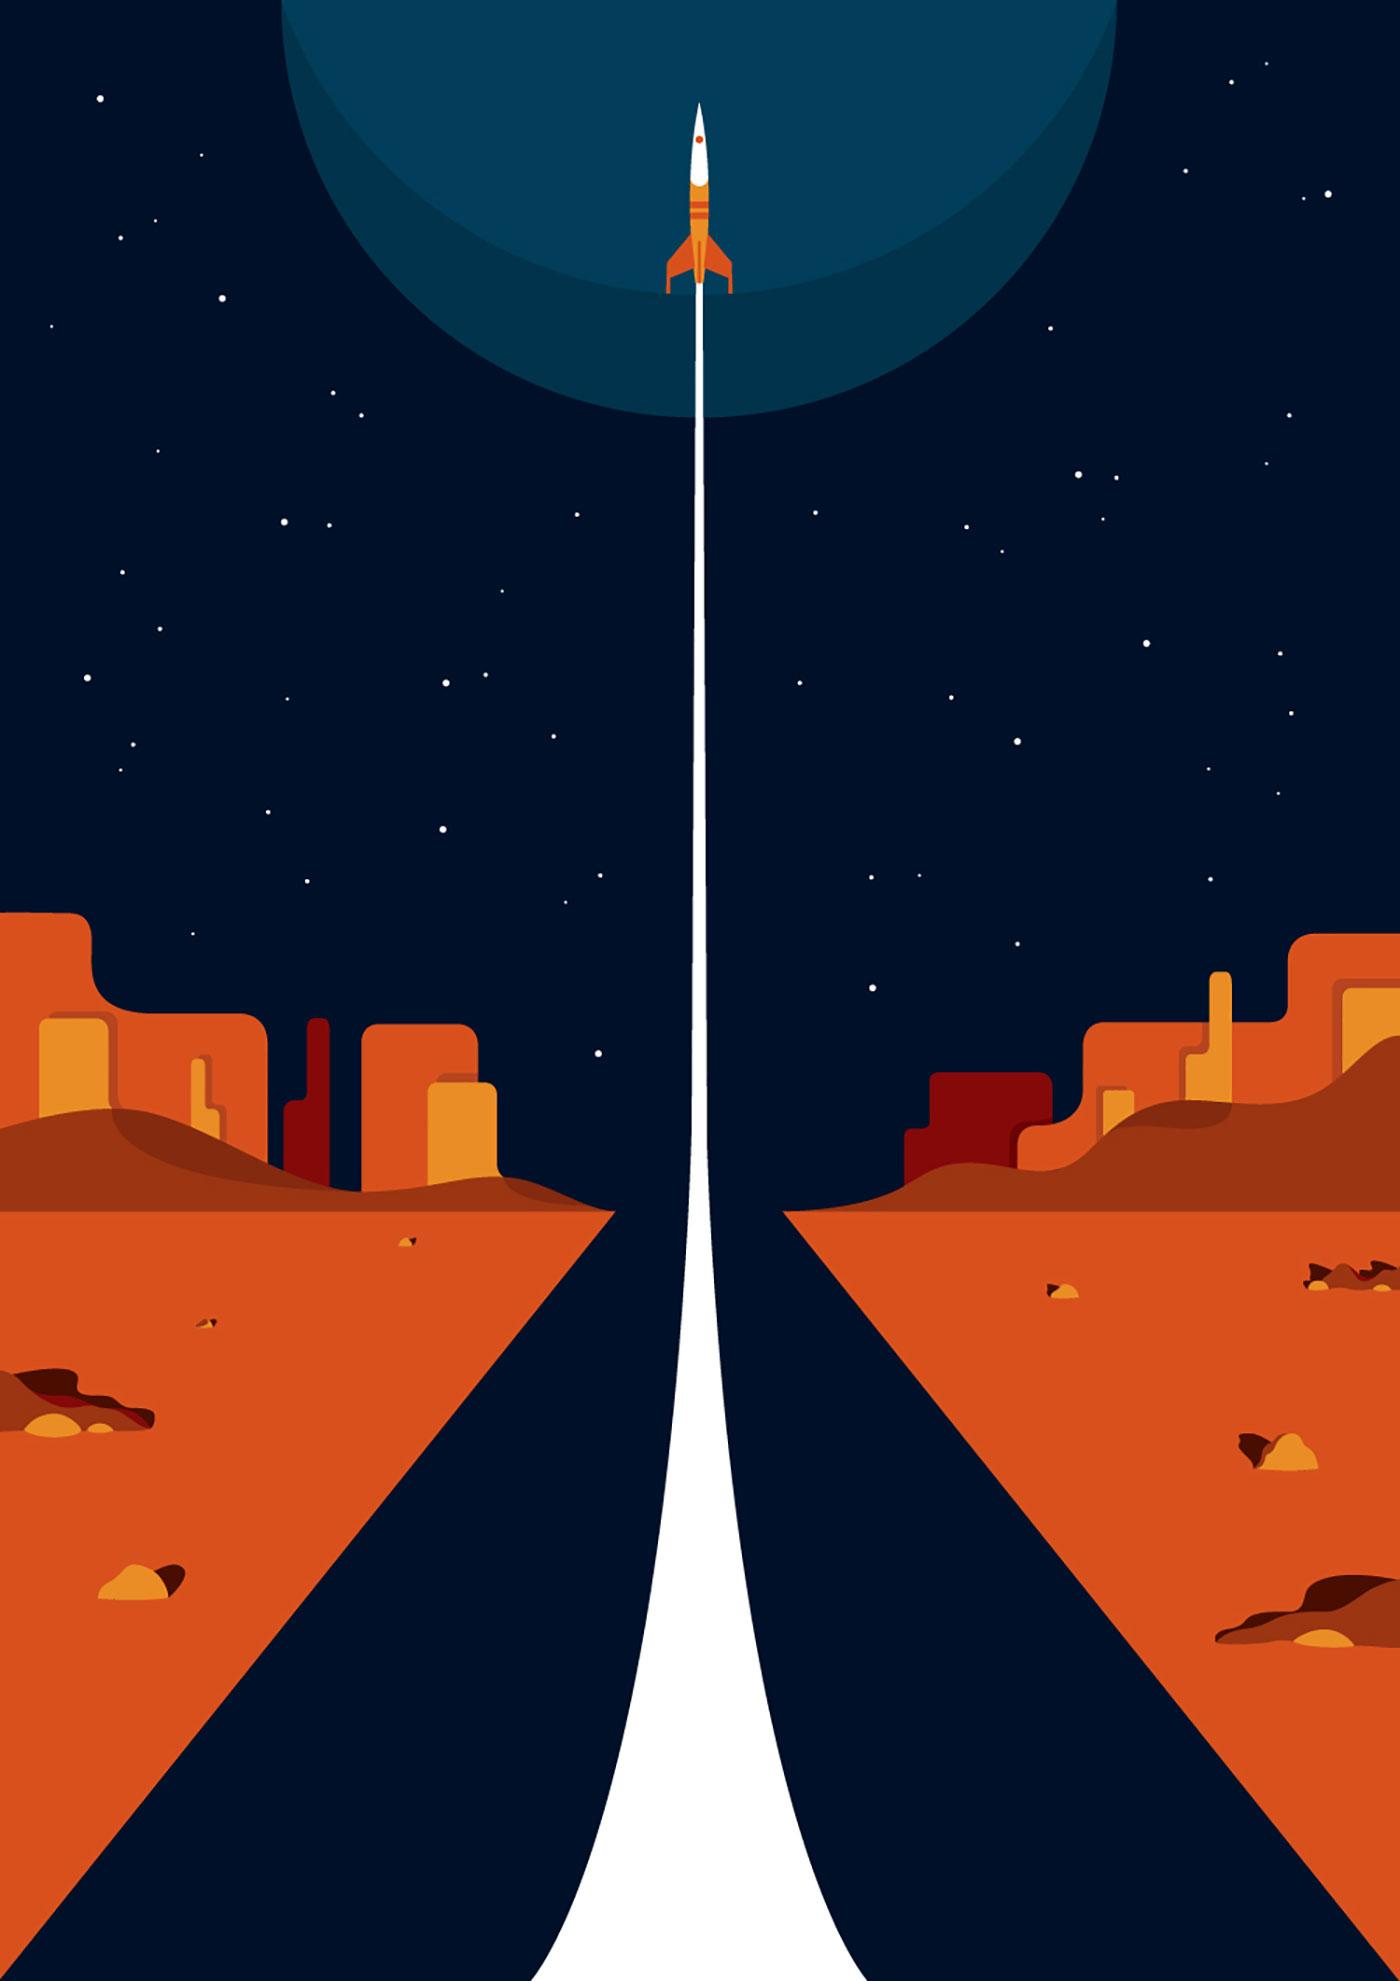 Richard Solomon - vanessa-branchi-031-spacetrip